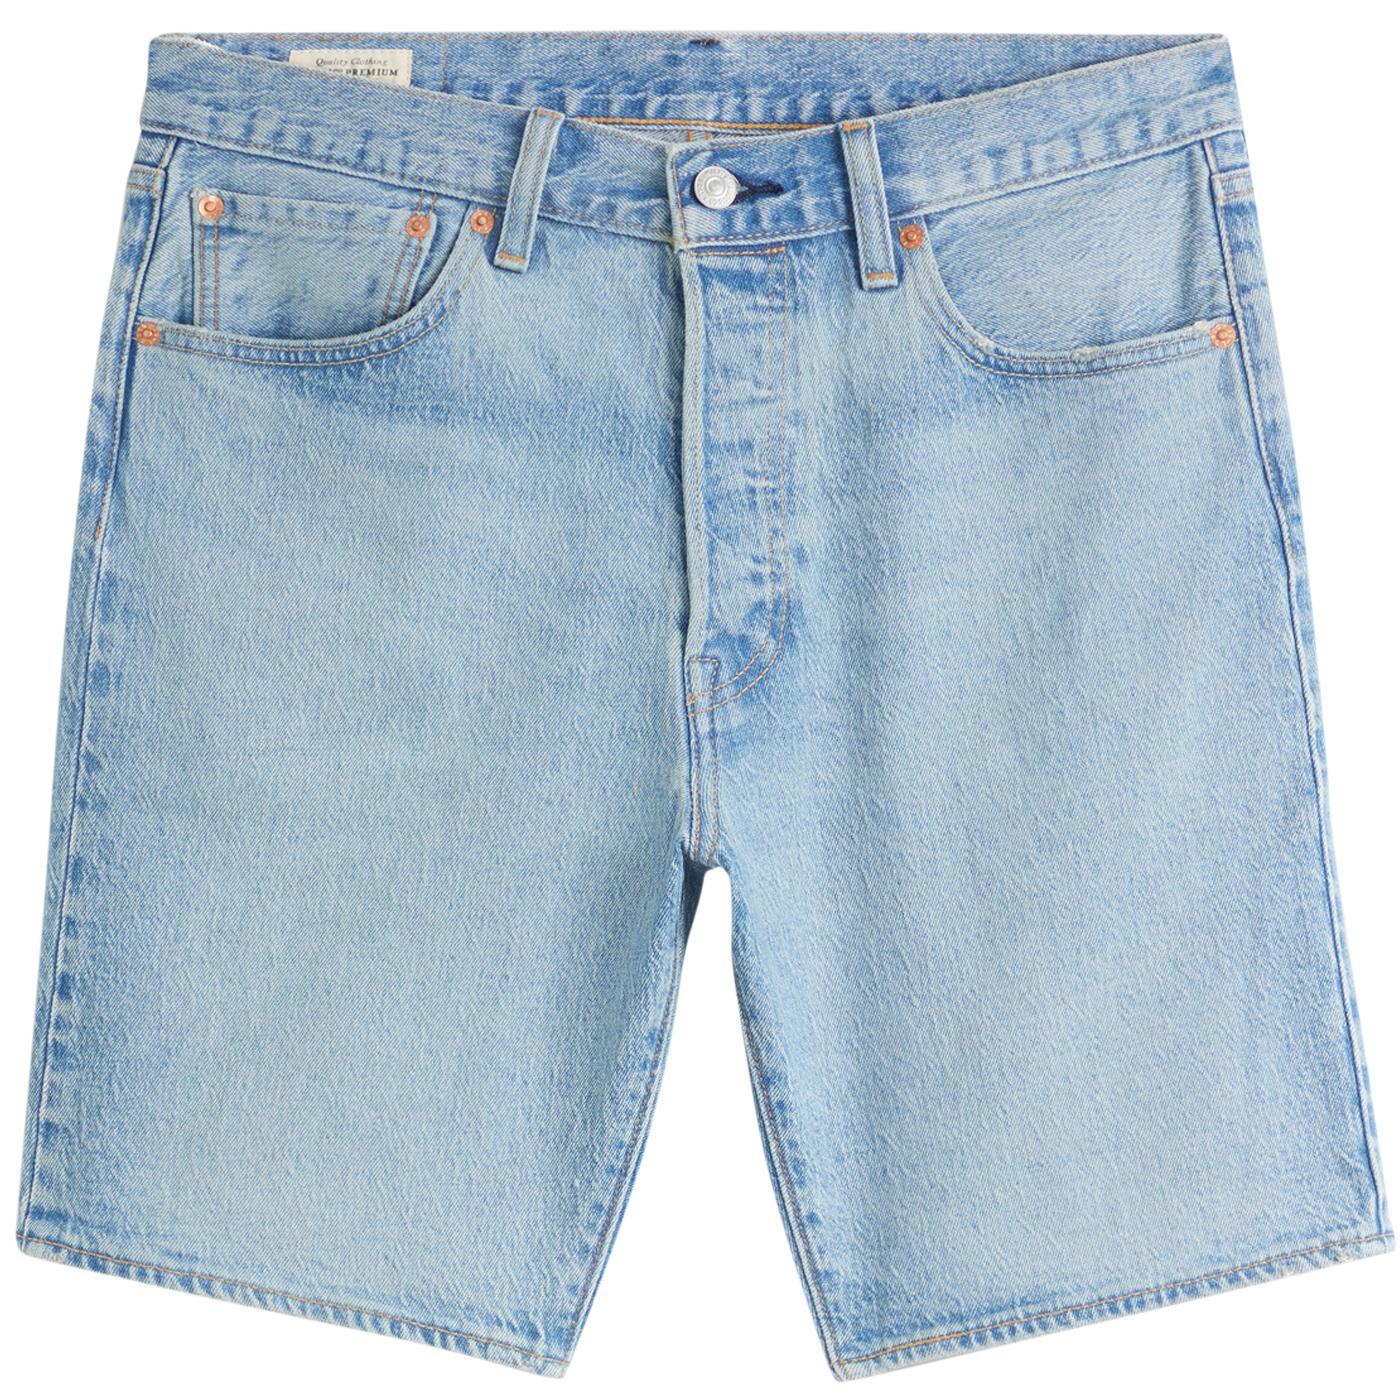 LEVI'S 501 Denim Hemmed Shorts (Mountain Life)